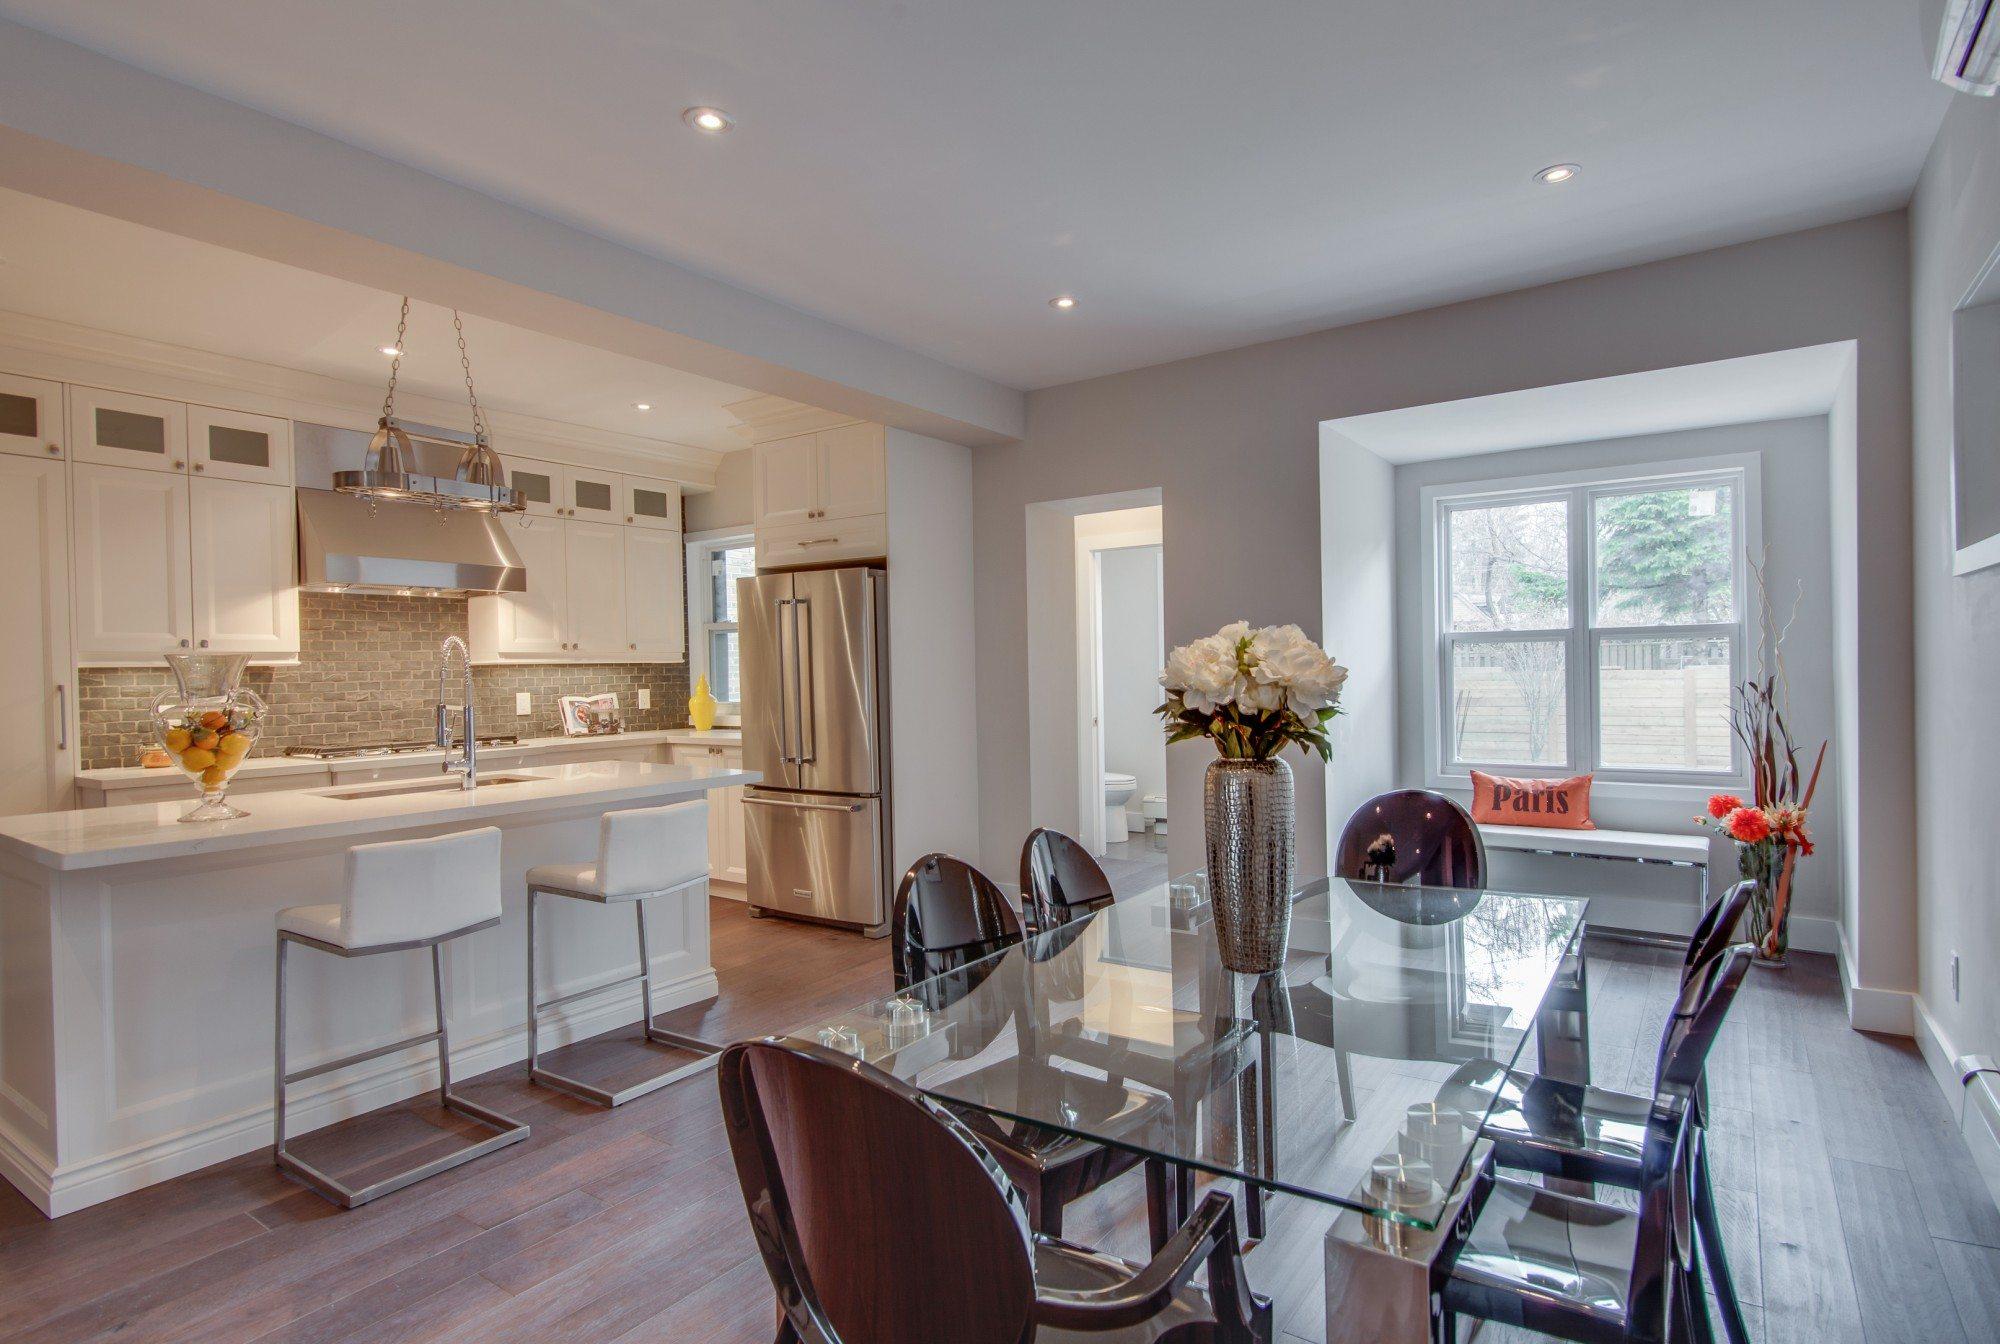 toronto-house-for-sale-309-sunnyside-avenue-4